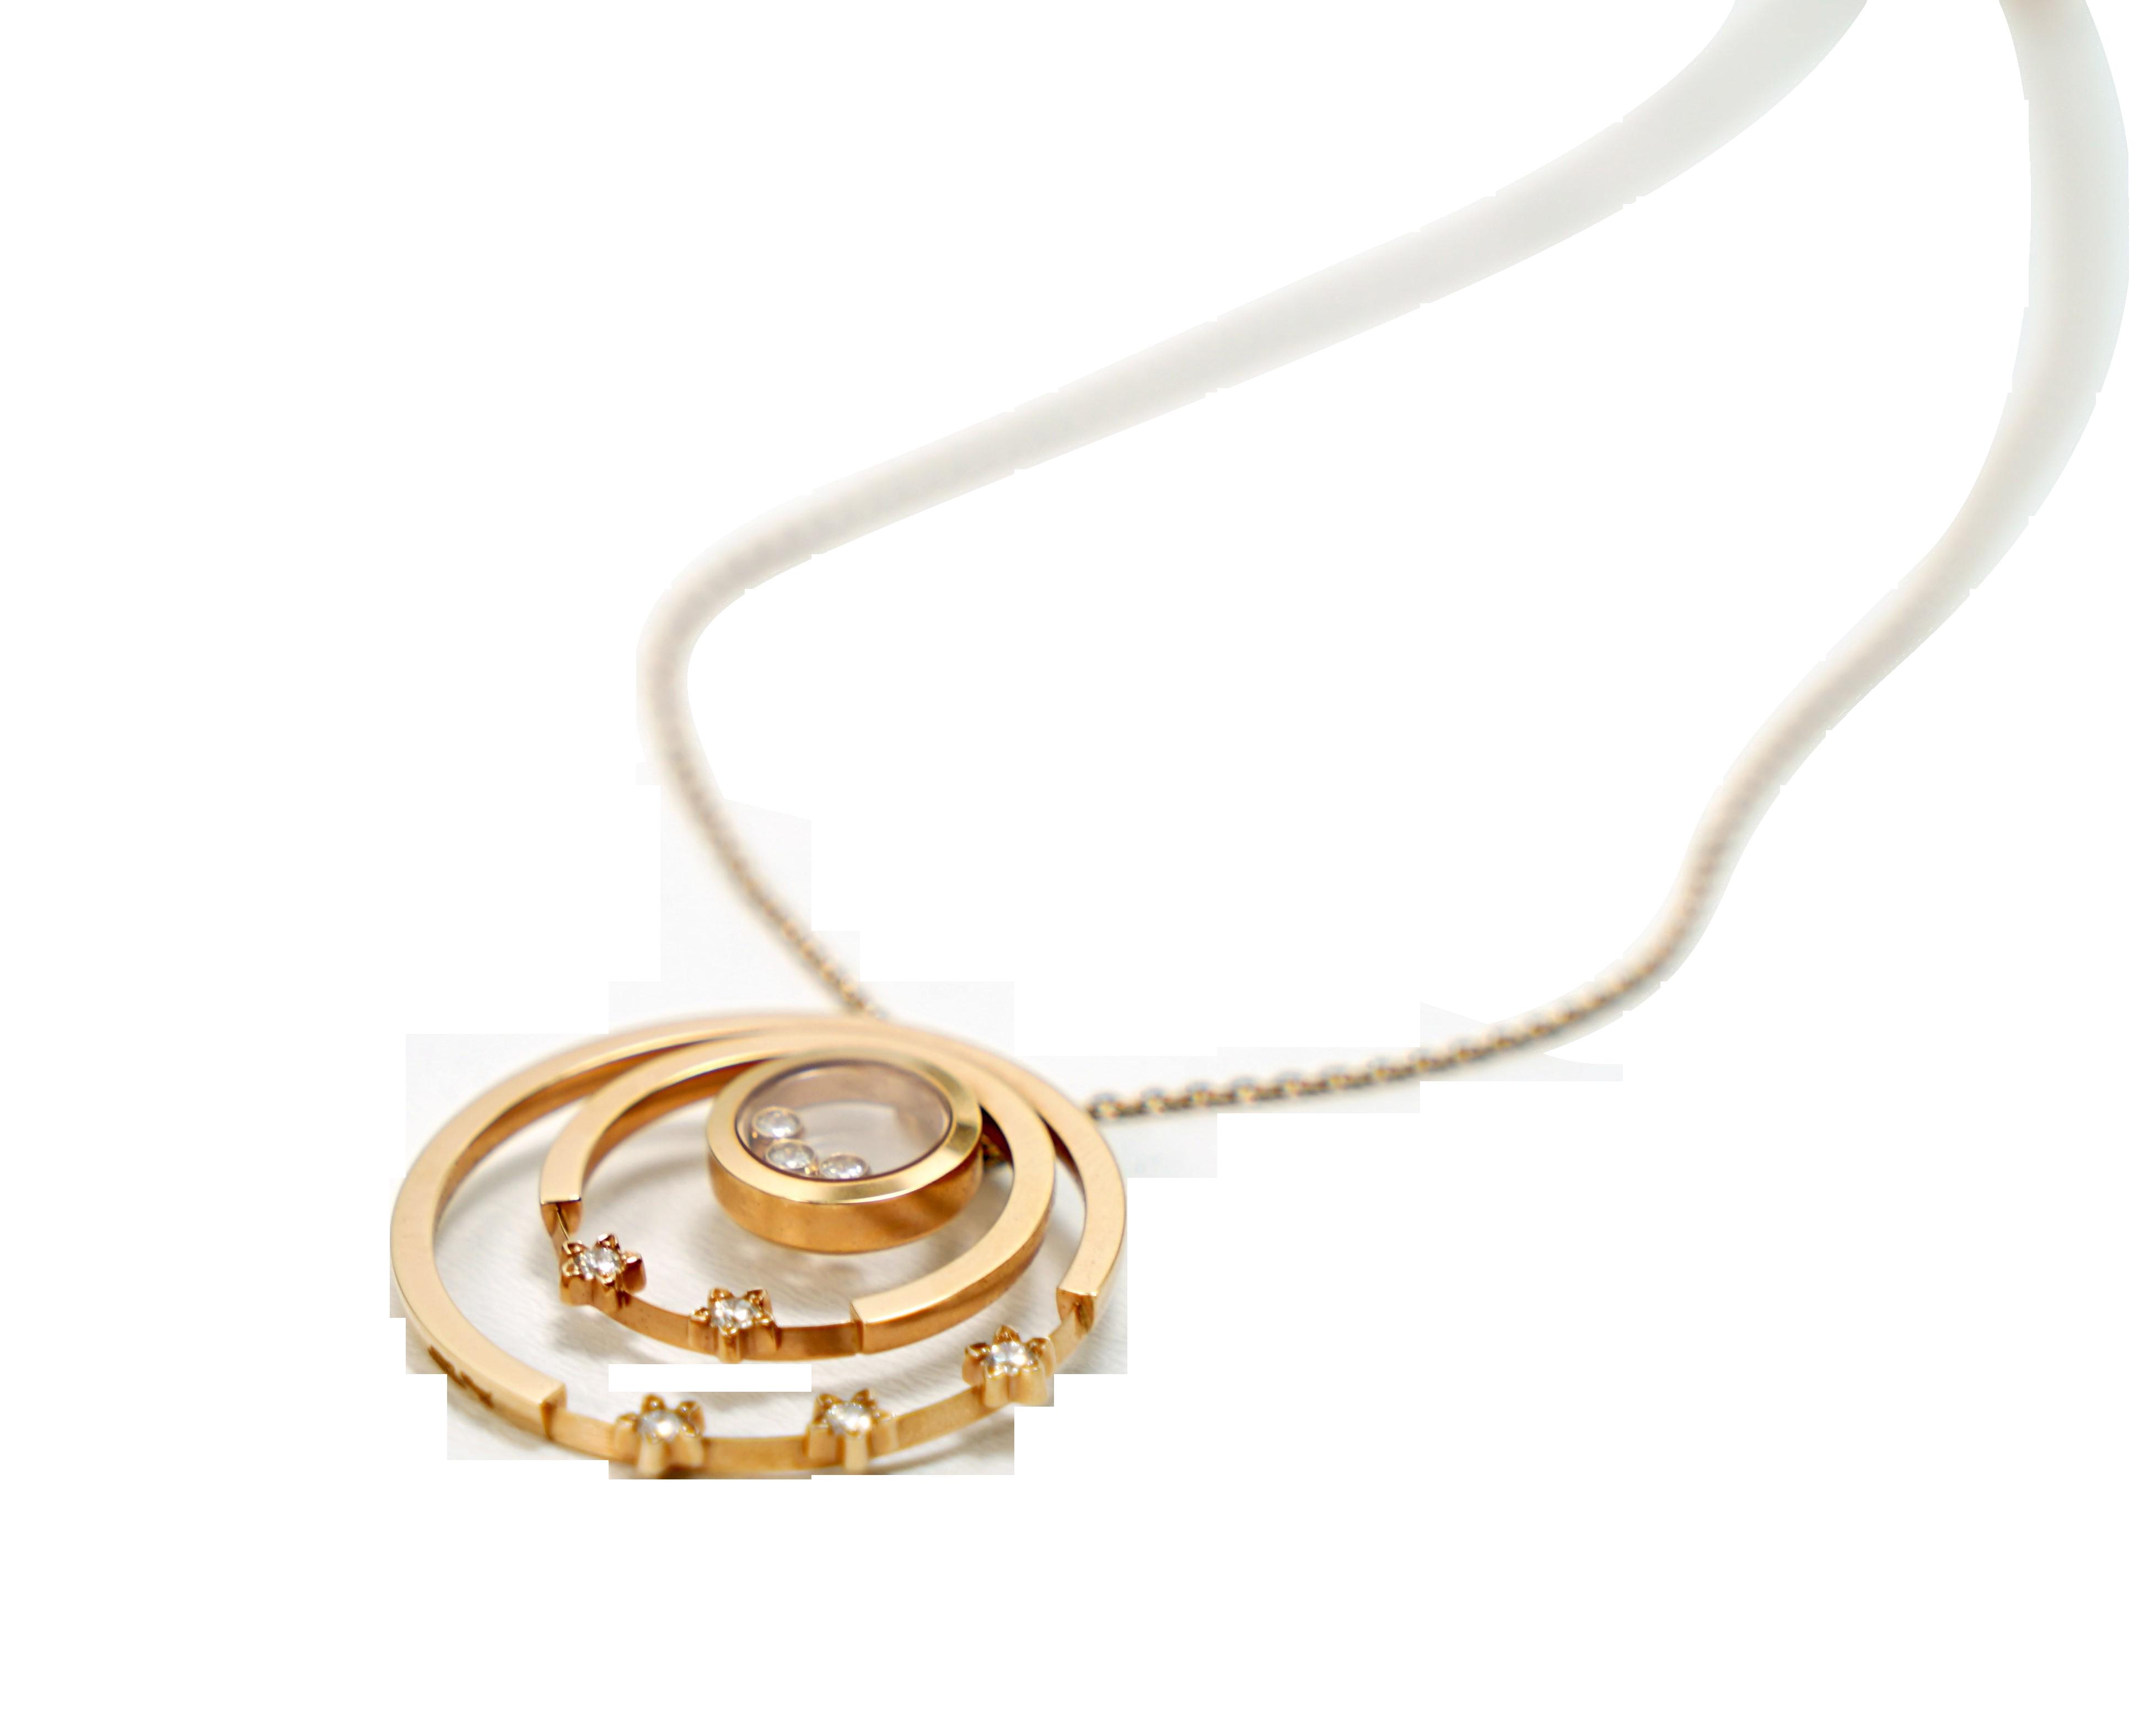 A Lady's Chopard 18K Rose Gold , Happy Diamonds pendant - Image 6 of 9